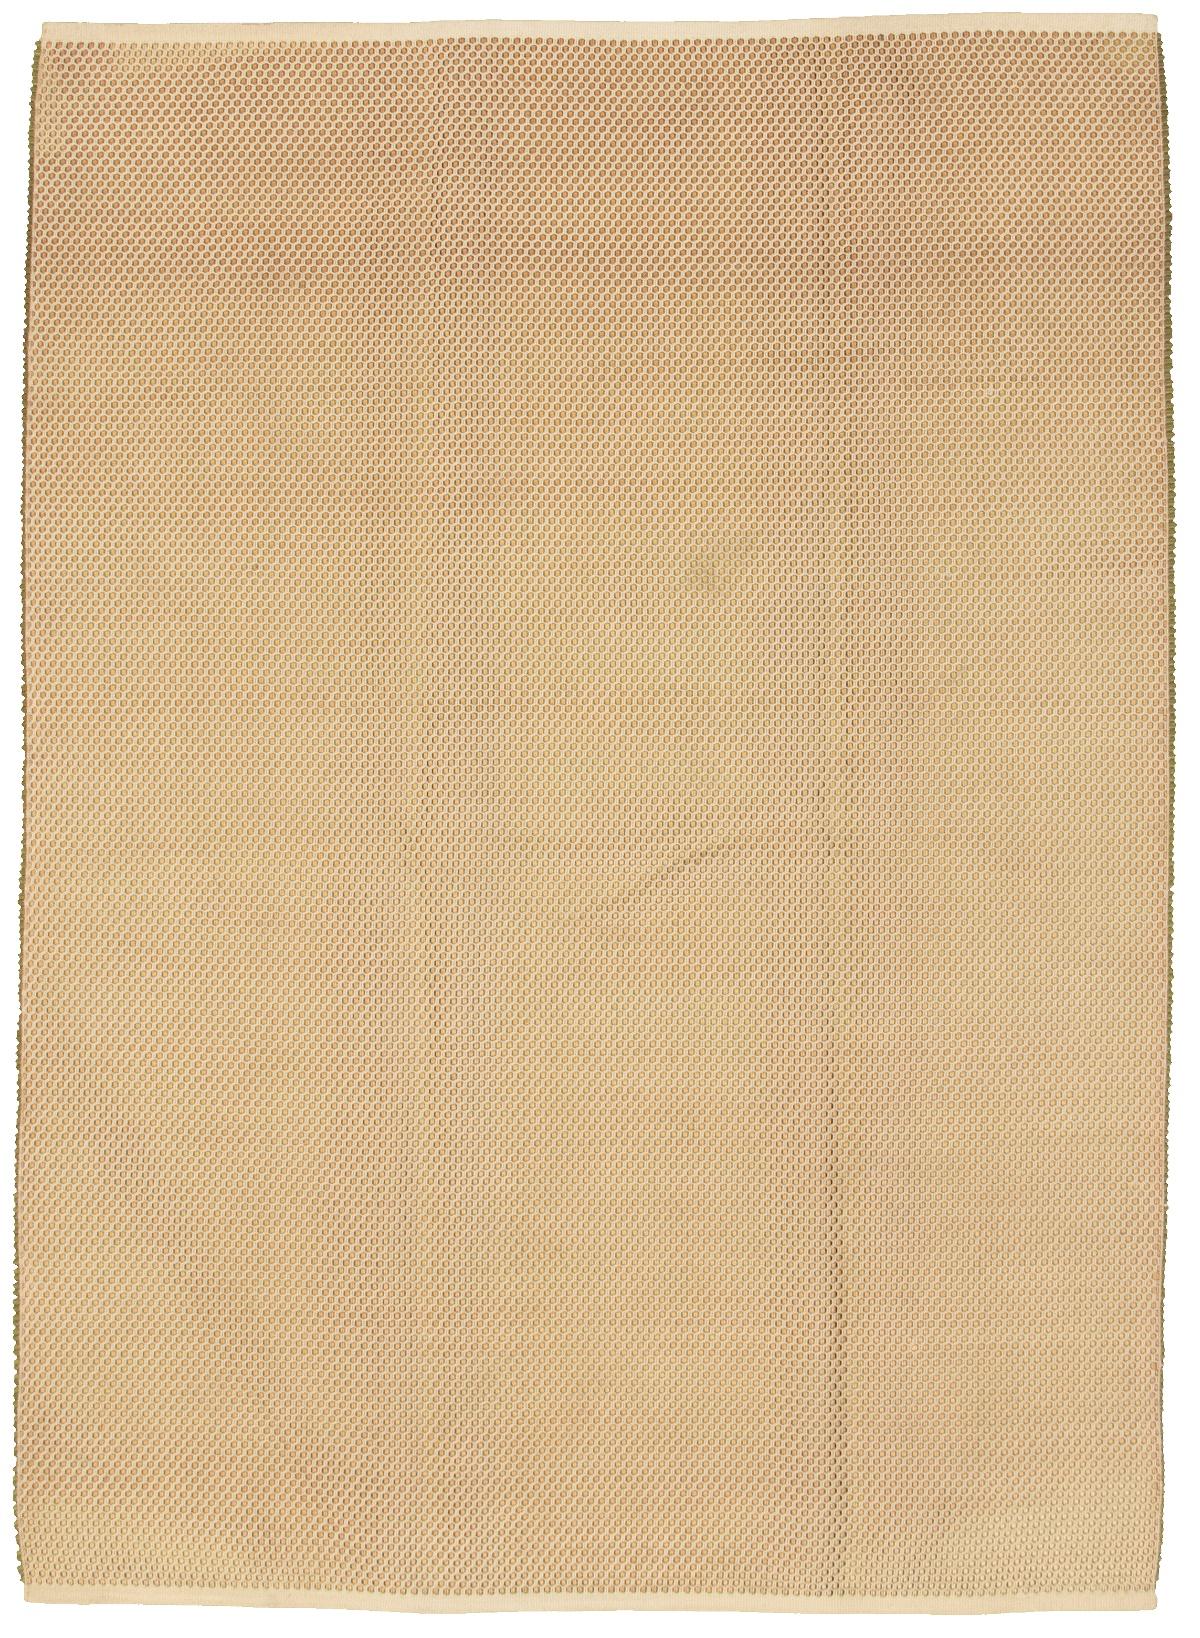 "Handmade Honeycomb III Light Gold Cotton/Polyester Rug 8'0"" x 11'6"" Size: 8'0"" x 11'6"""